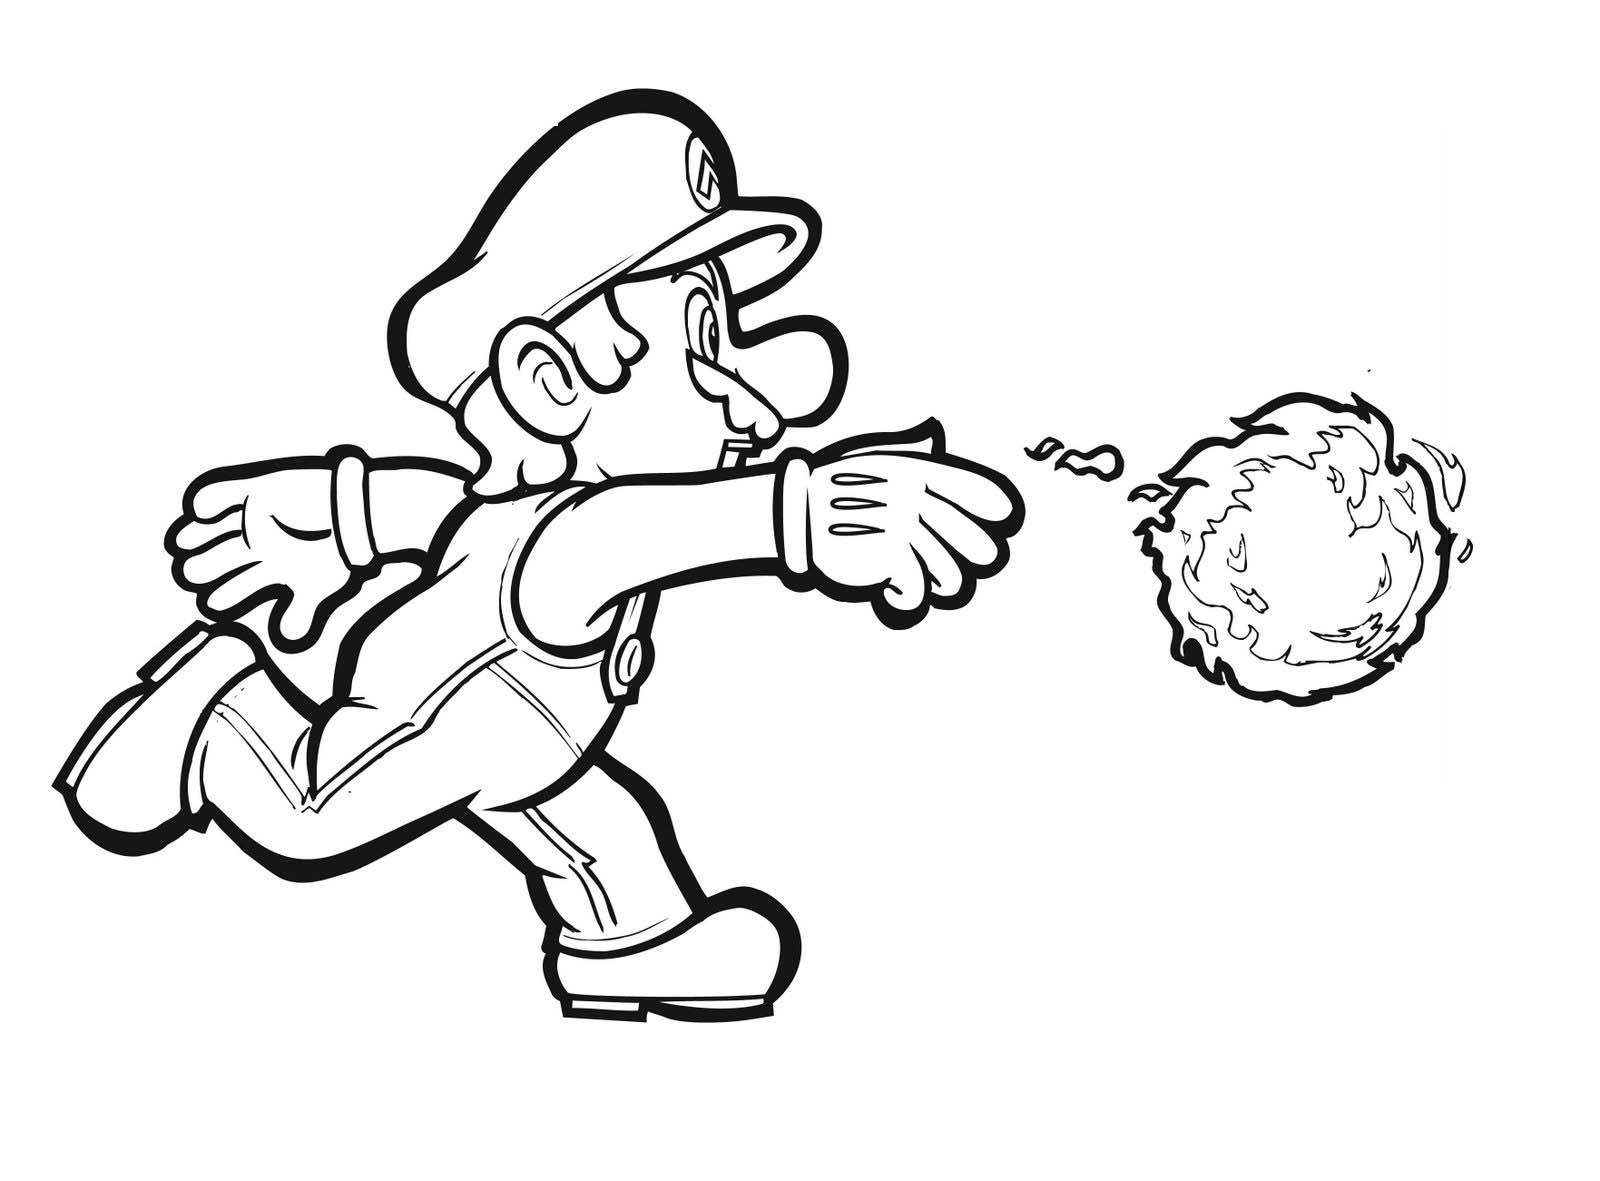 Mario Kart Drawing